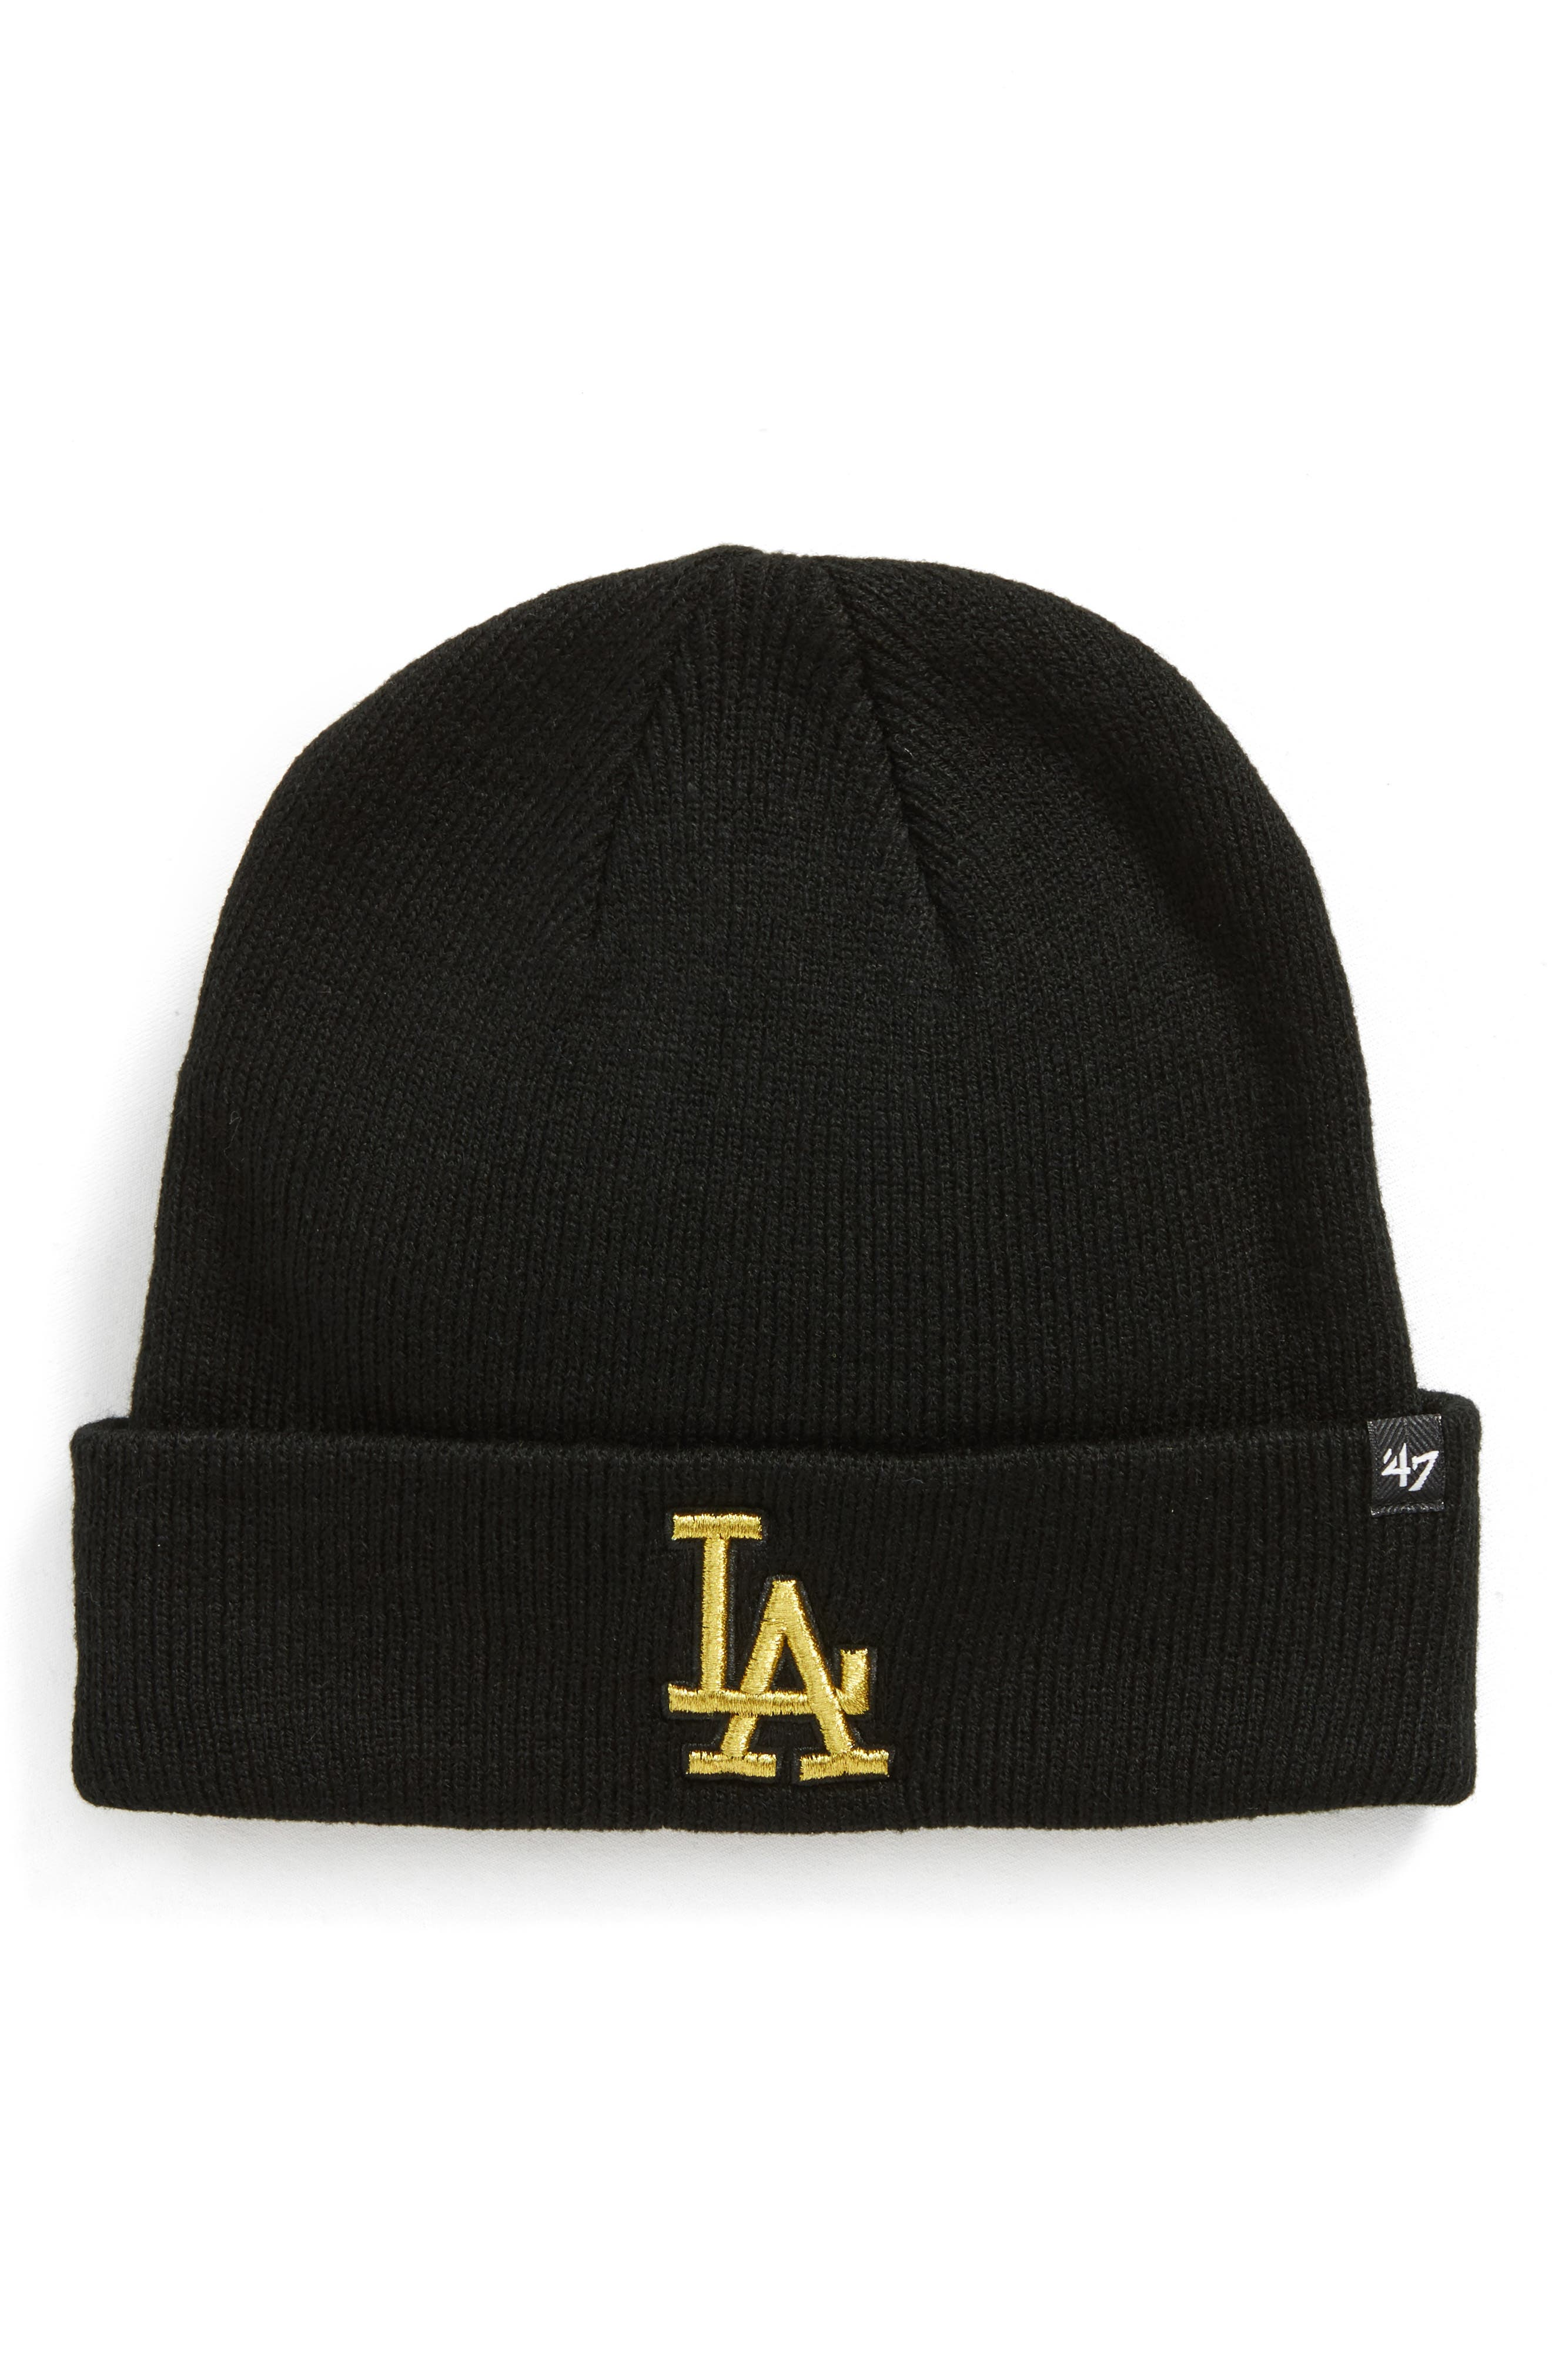 Main Image - '47 Brand Los Angeles Dodgers Metallic Beanie